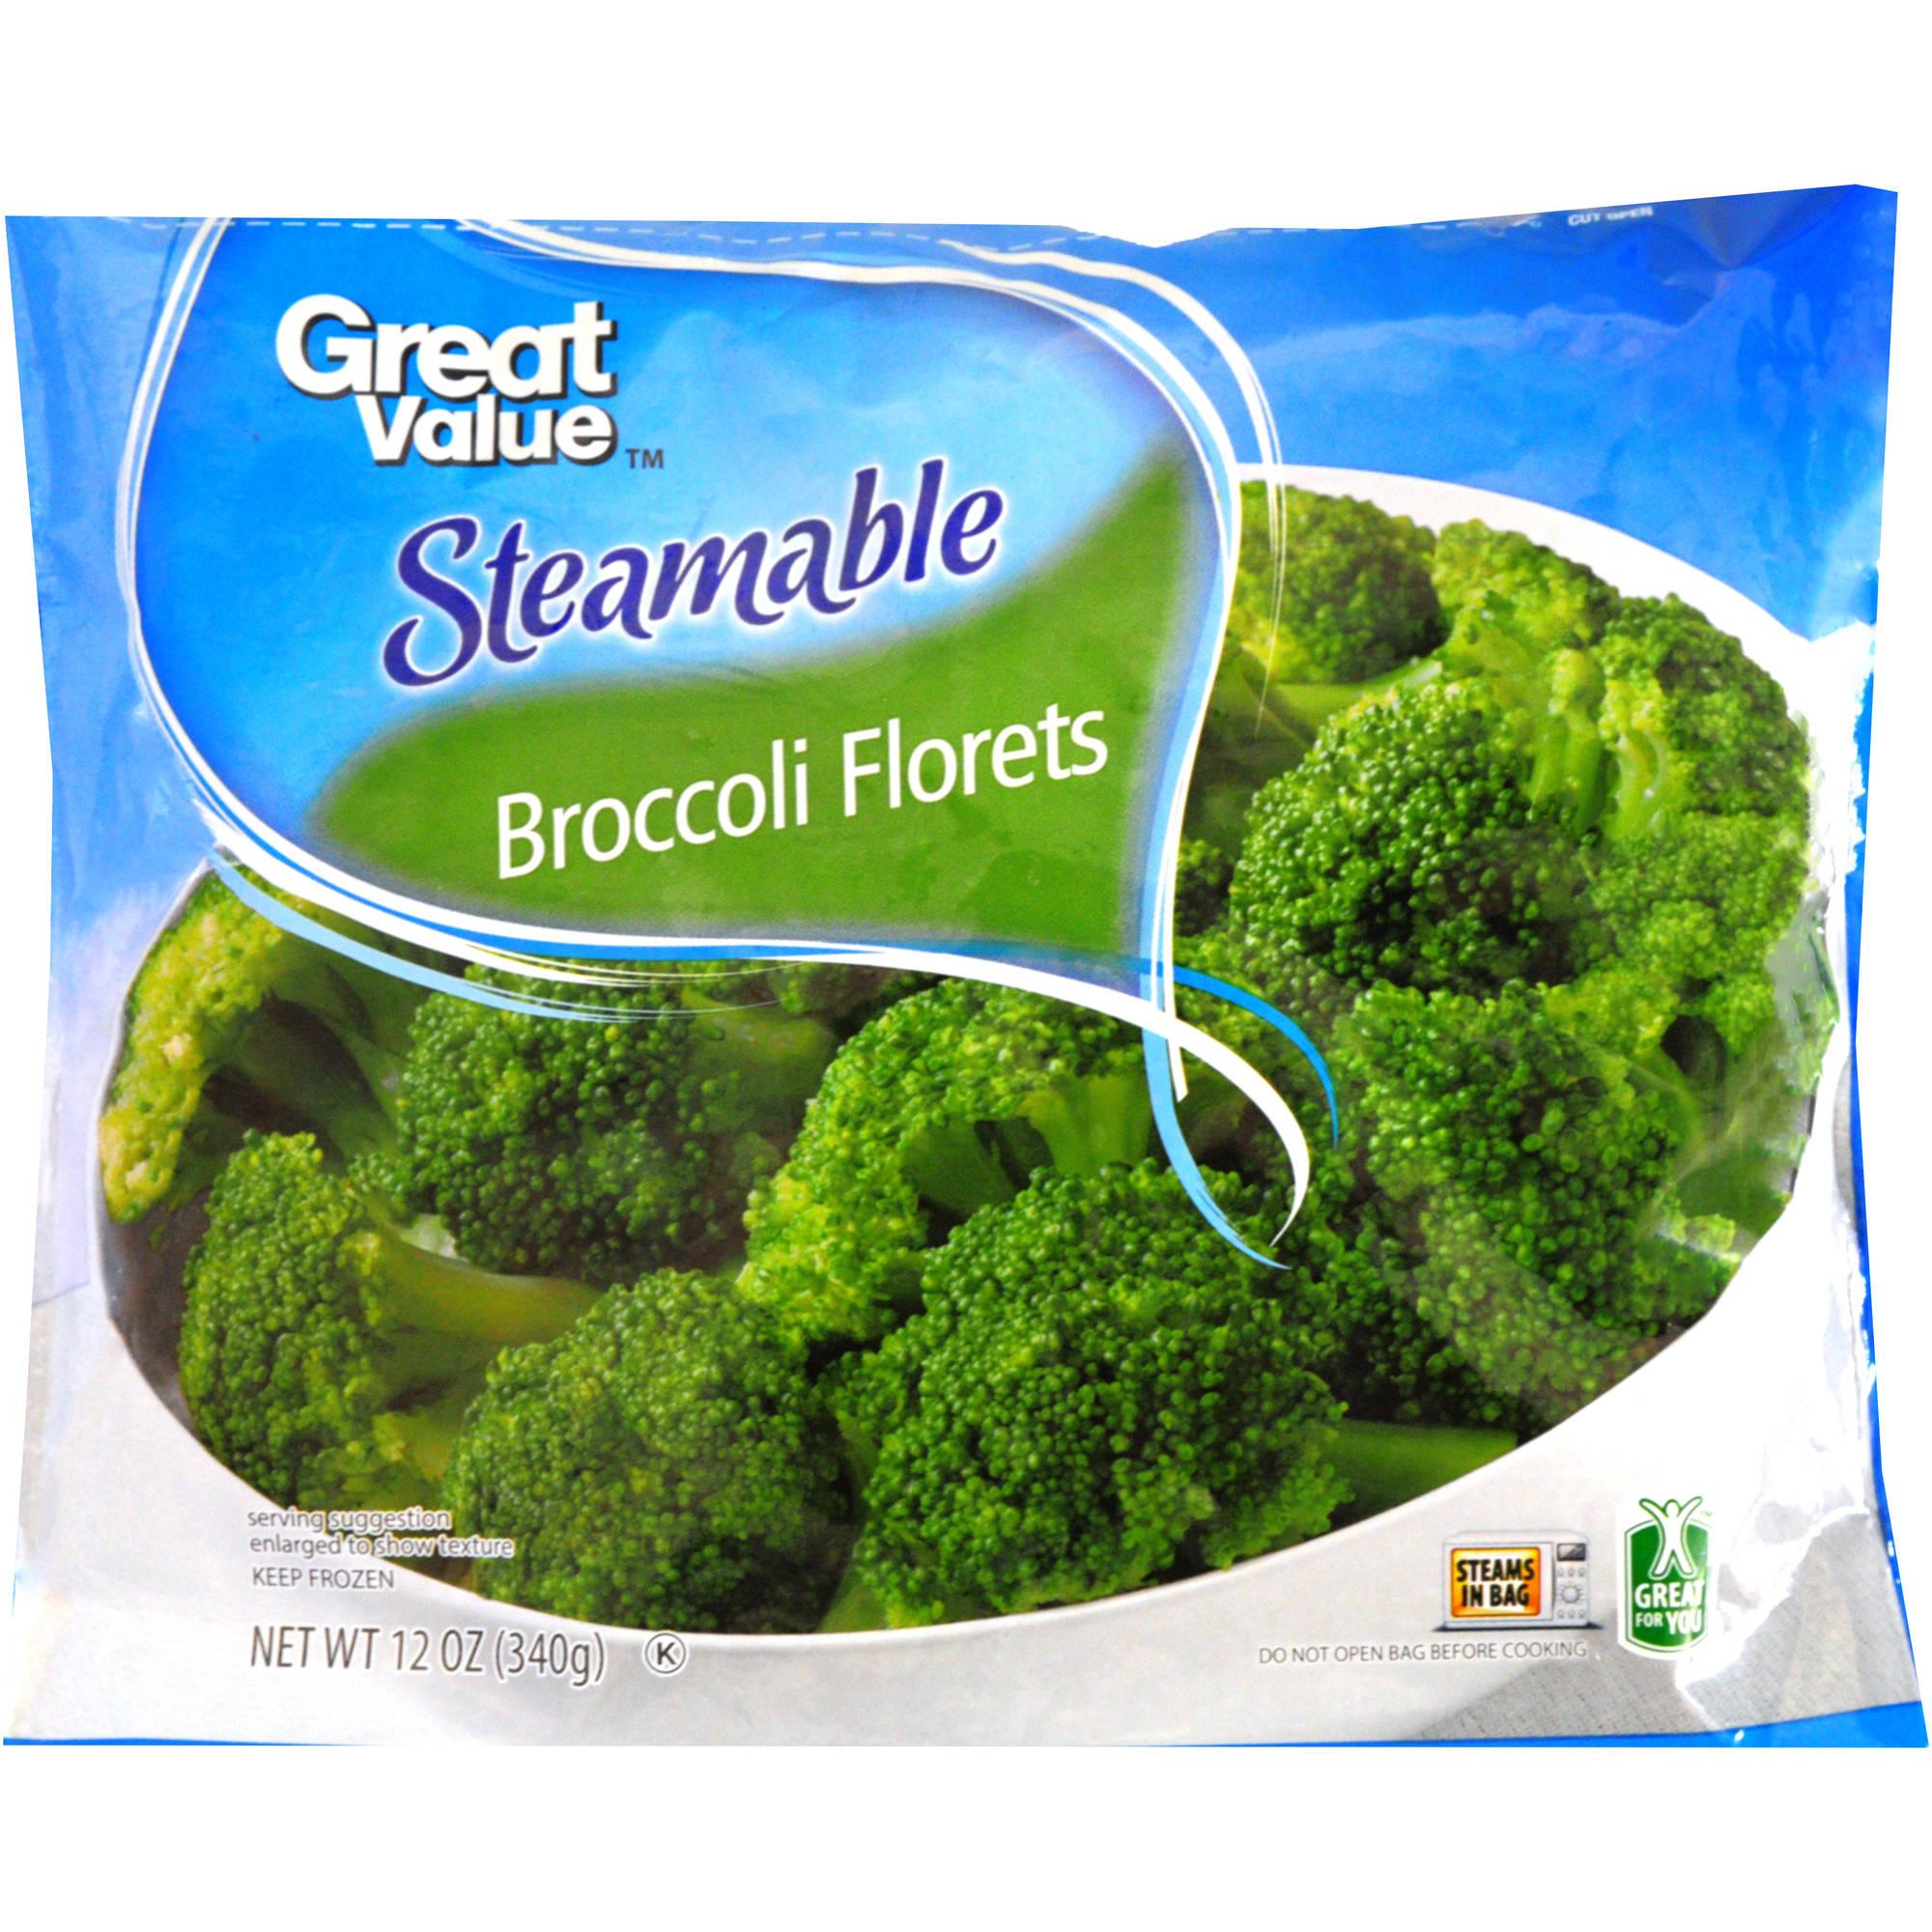 Great Value(tm) Steamable Broccoli Florets, 12 oz